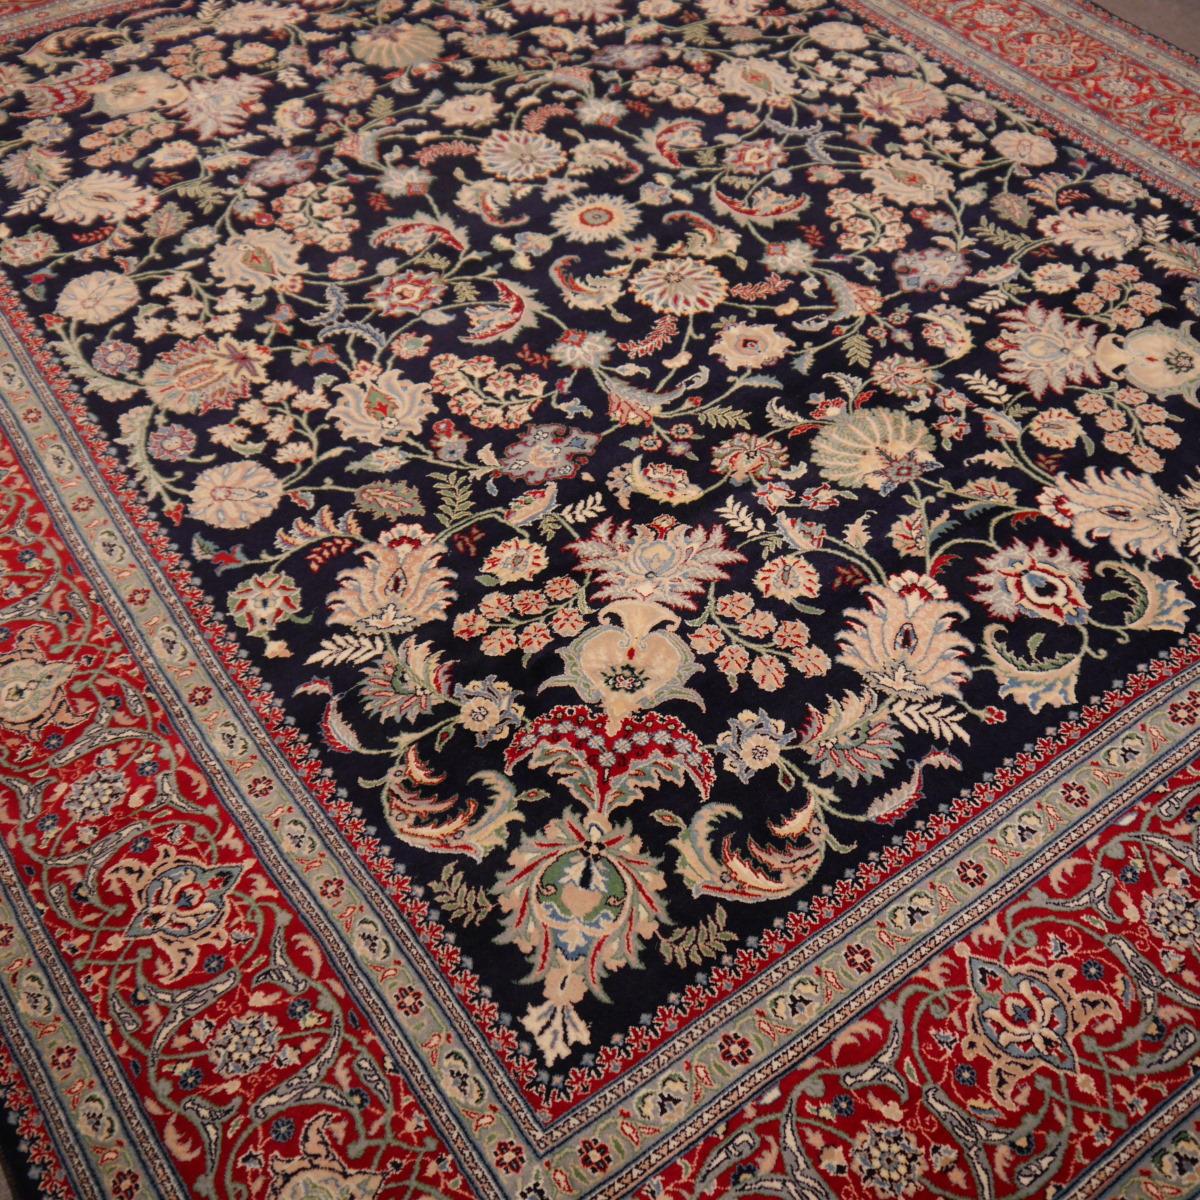 13909 isfahan teppich 300 x 240 cm sehr fein. Black Bedroom Furniture Sets. Home Design Ideas